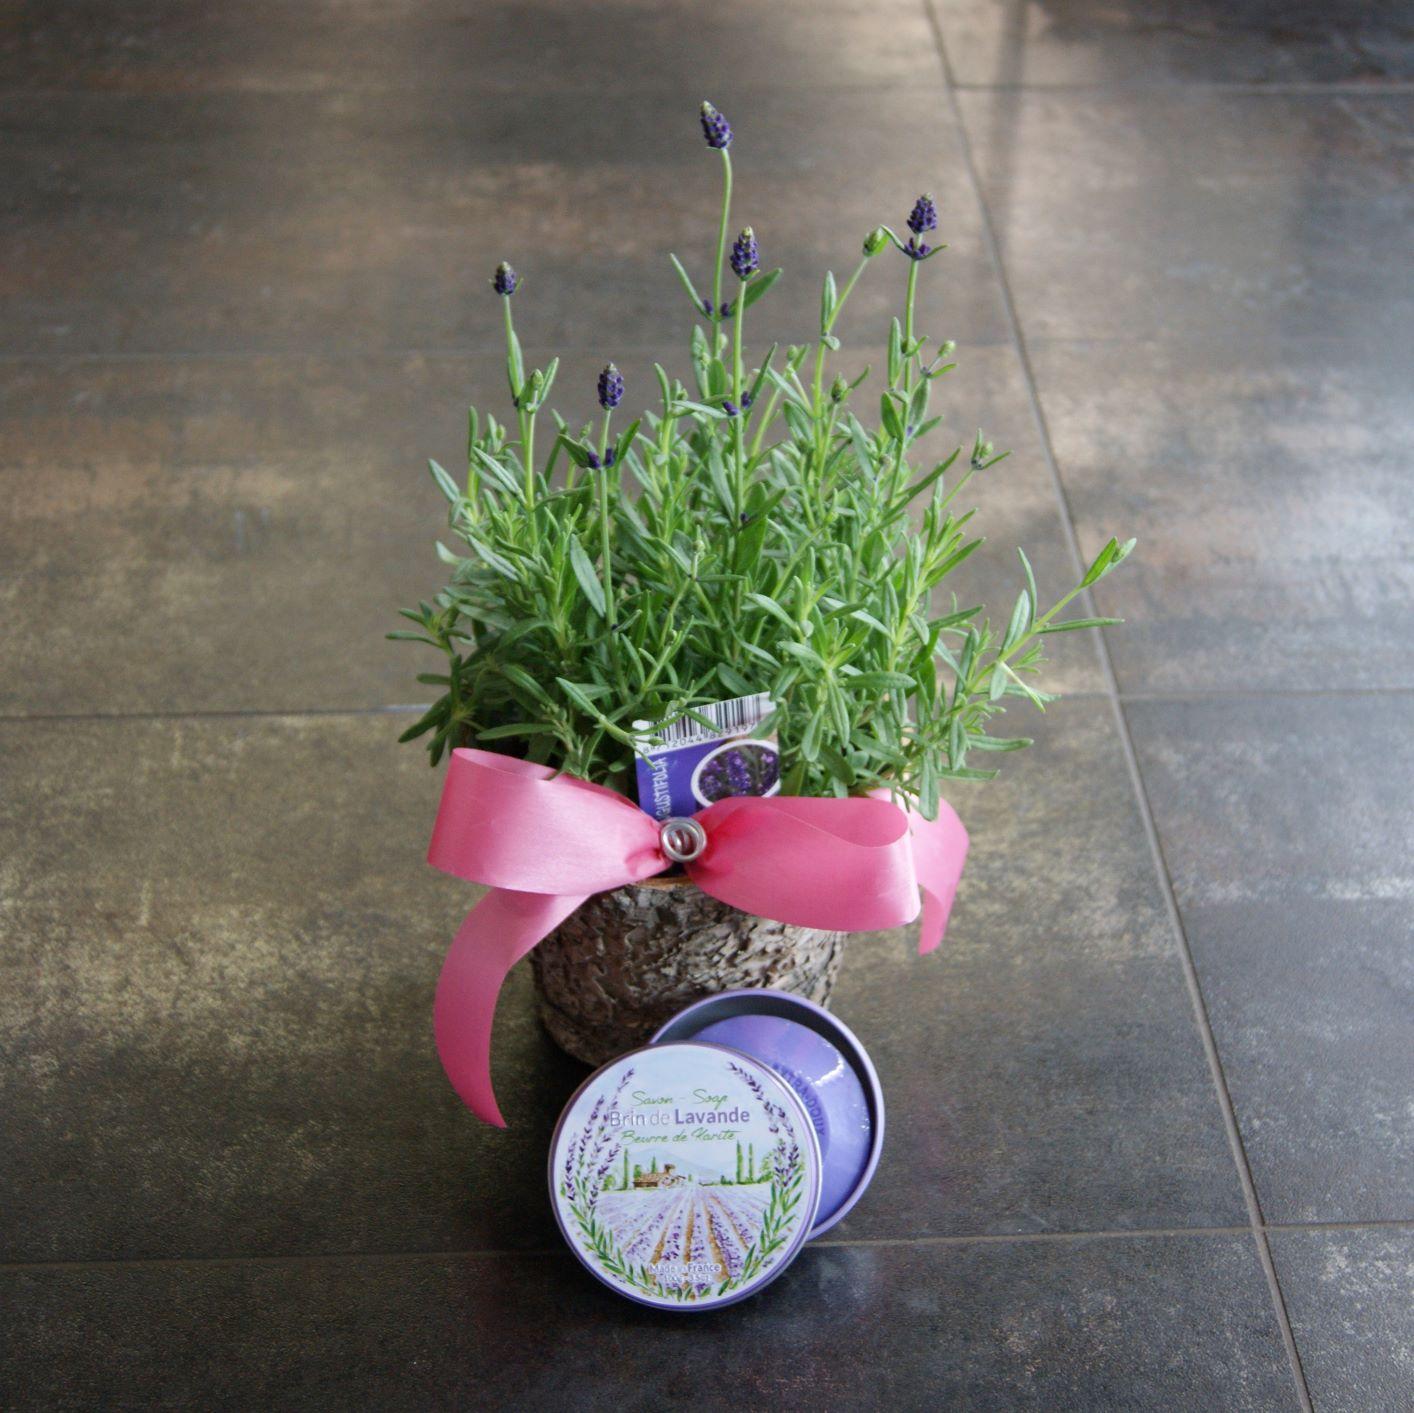 Plante et savon de lavande N°24